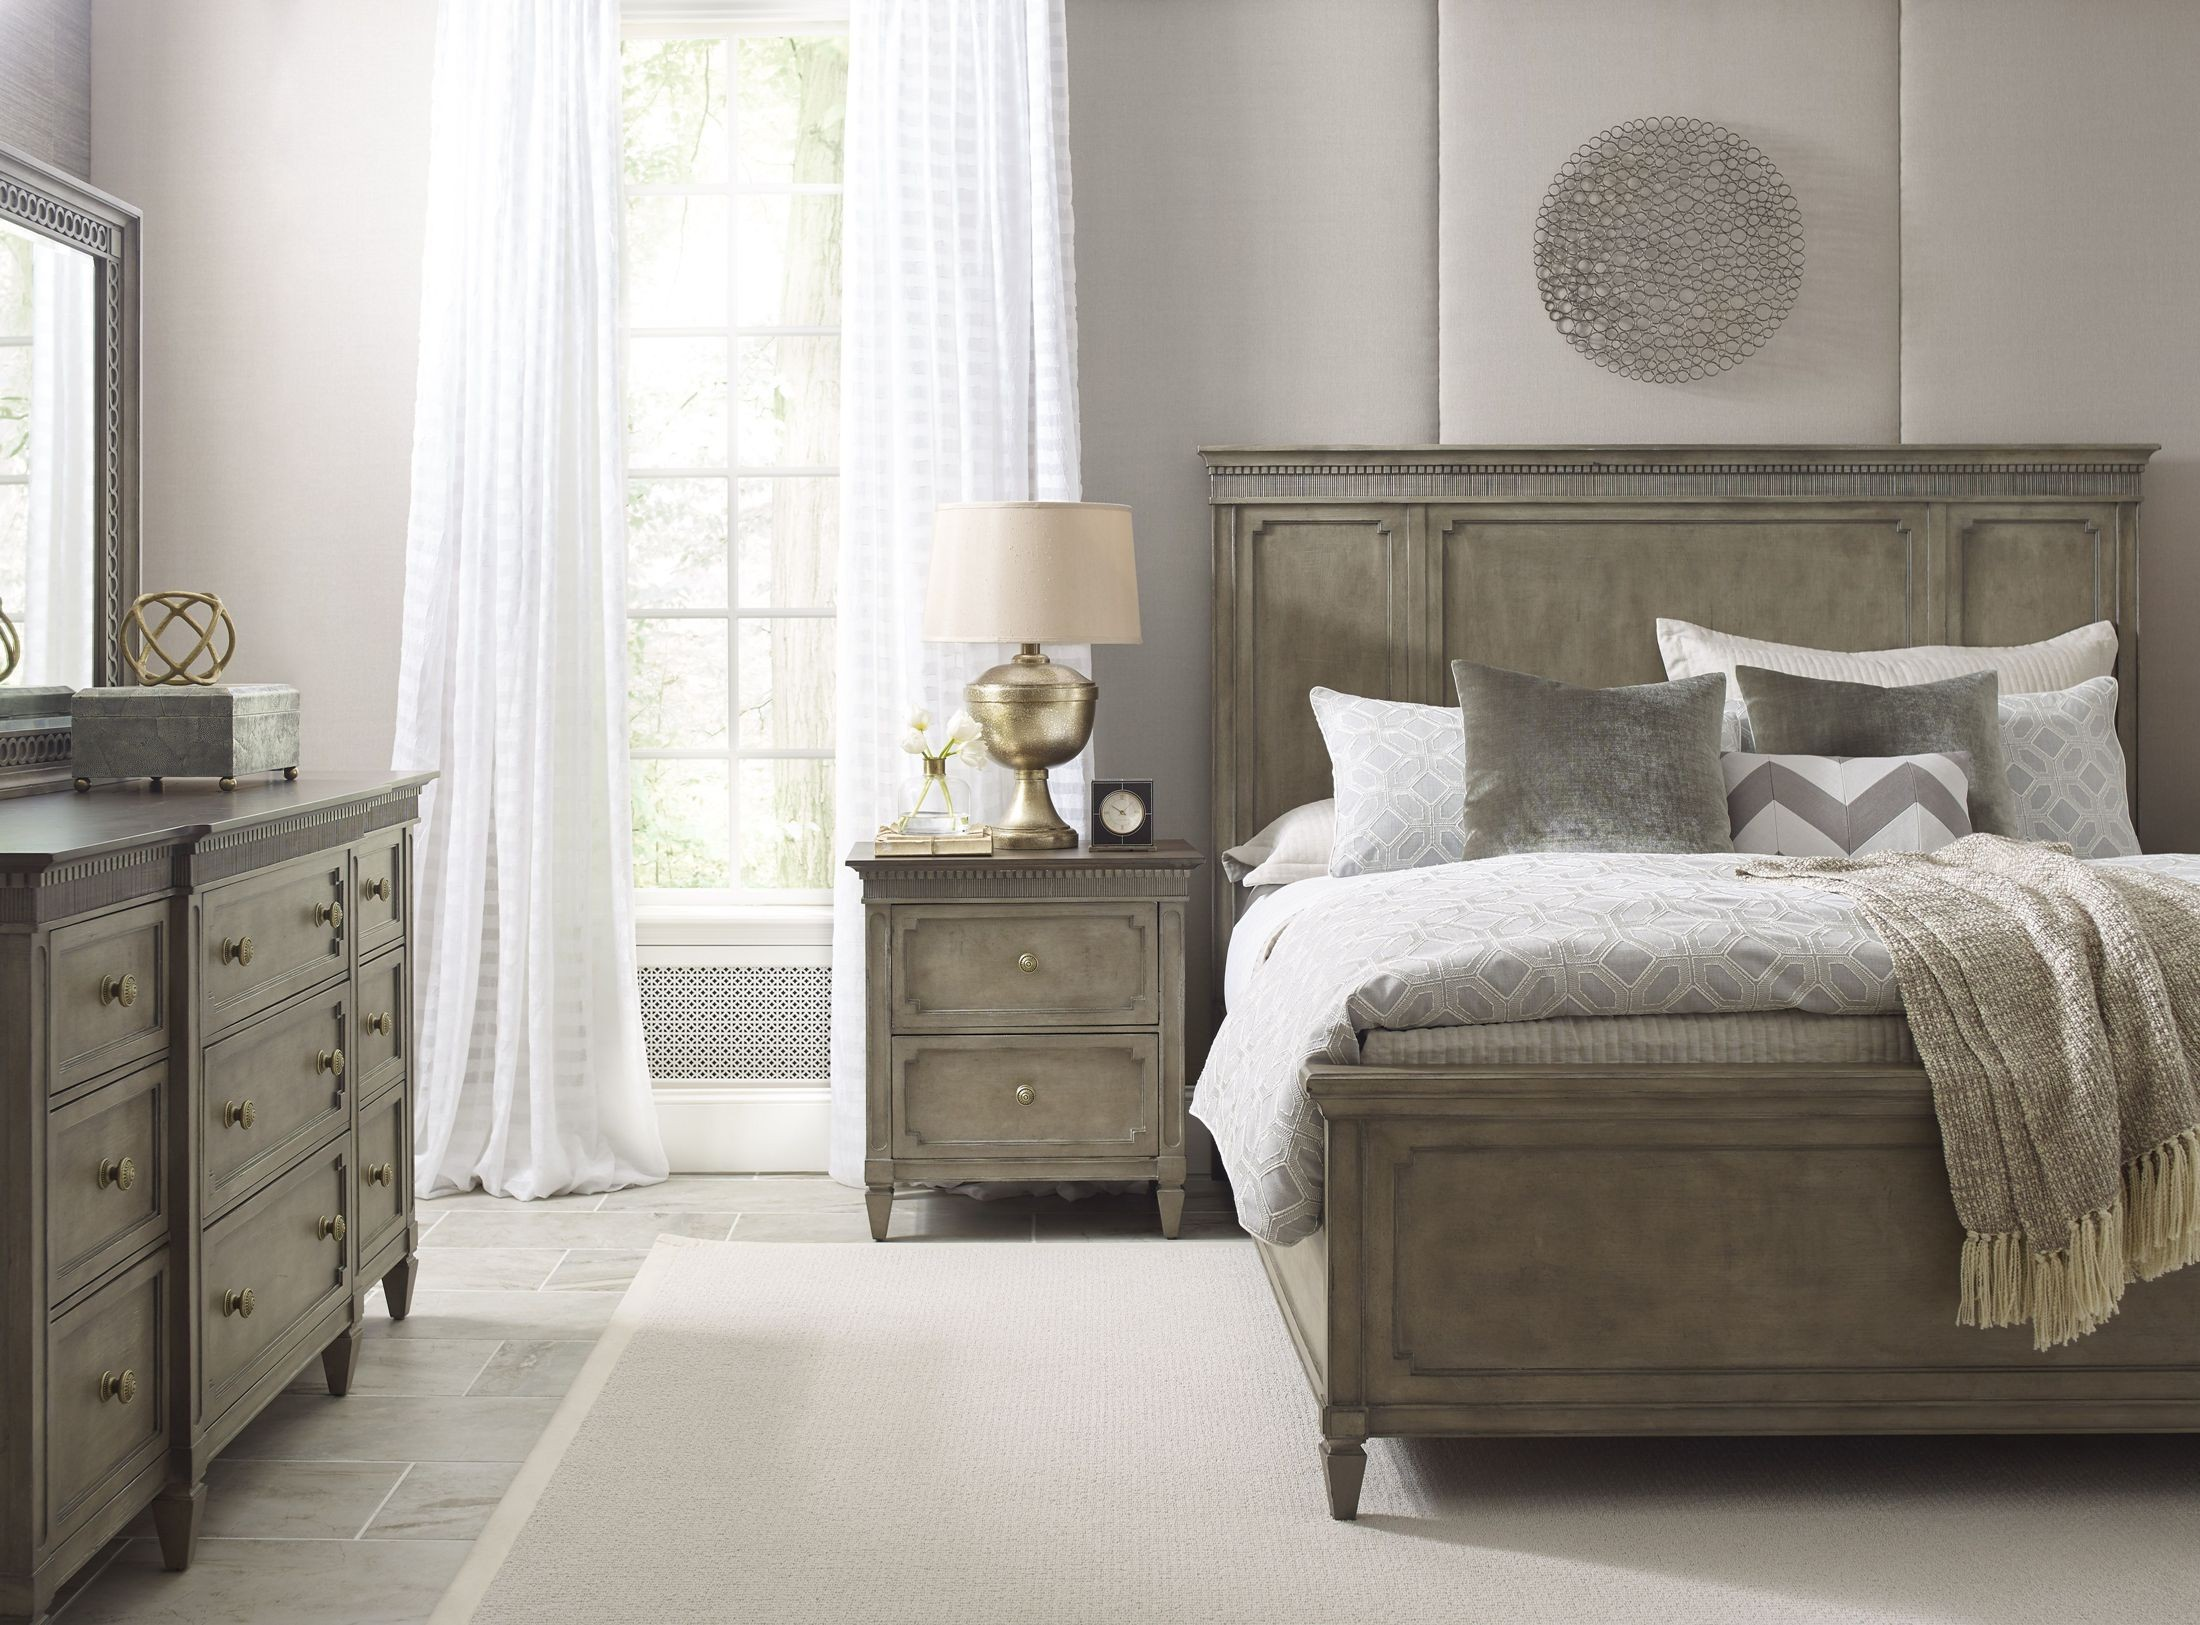 savona versaille katrine panel bedroom set from american